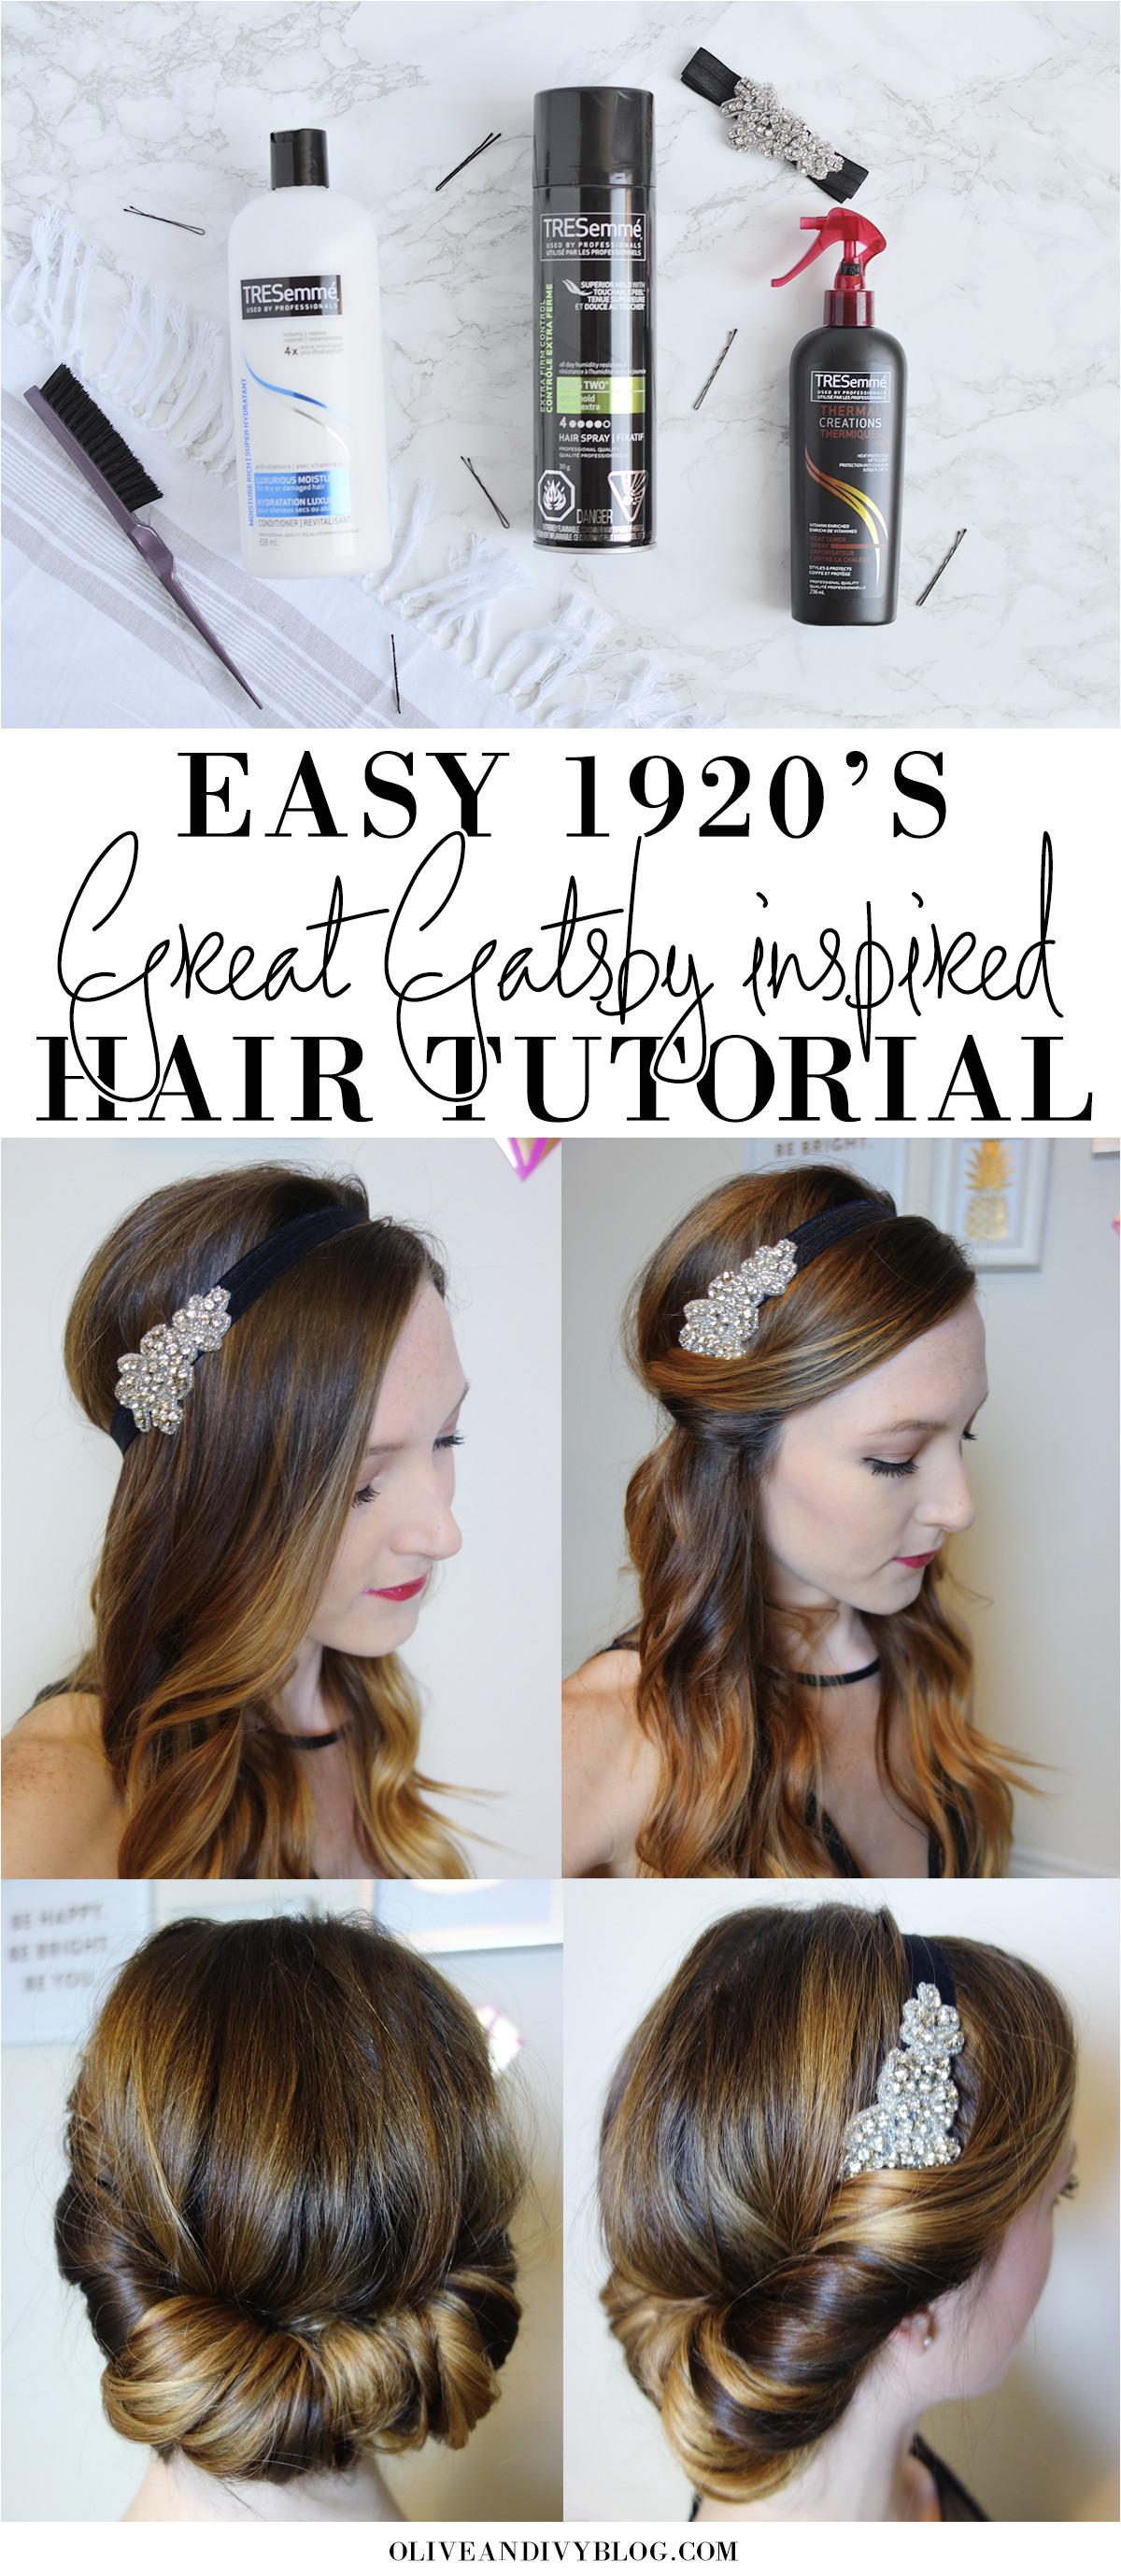 Easy 1920 s Great Gatsby hair tutorial AD